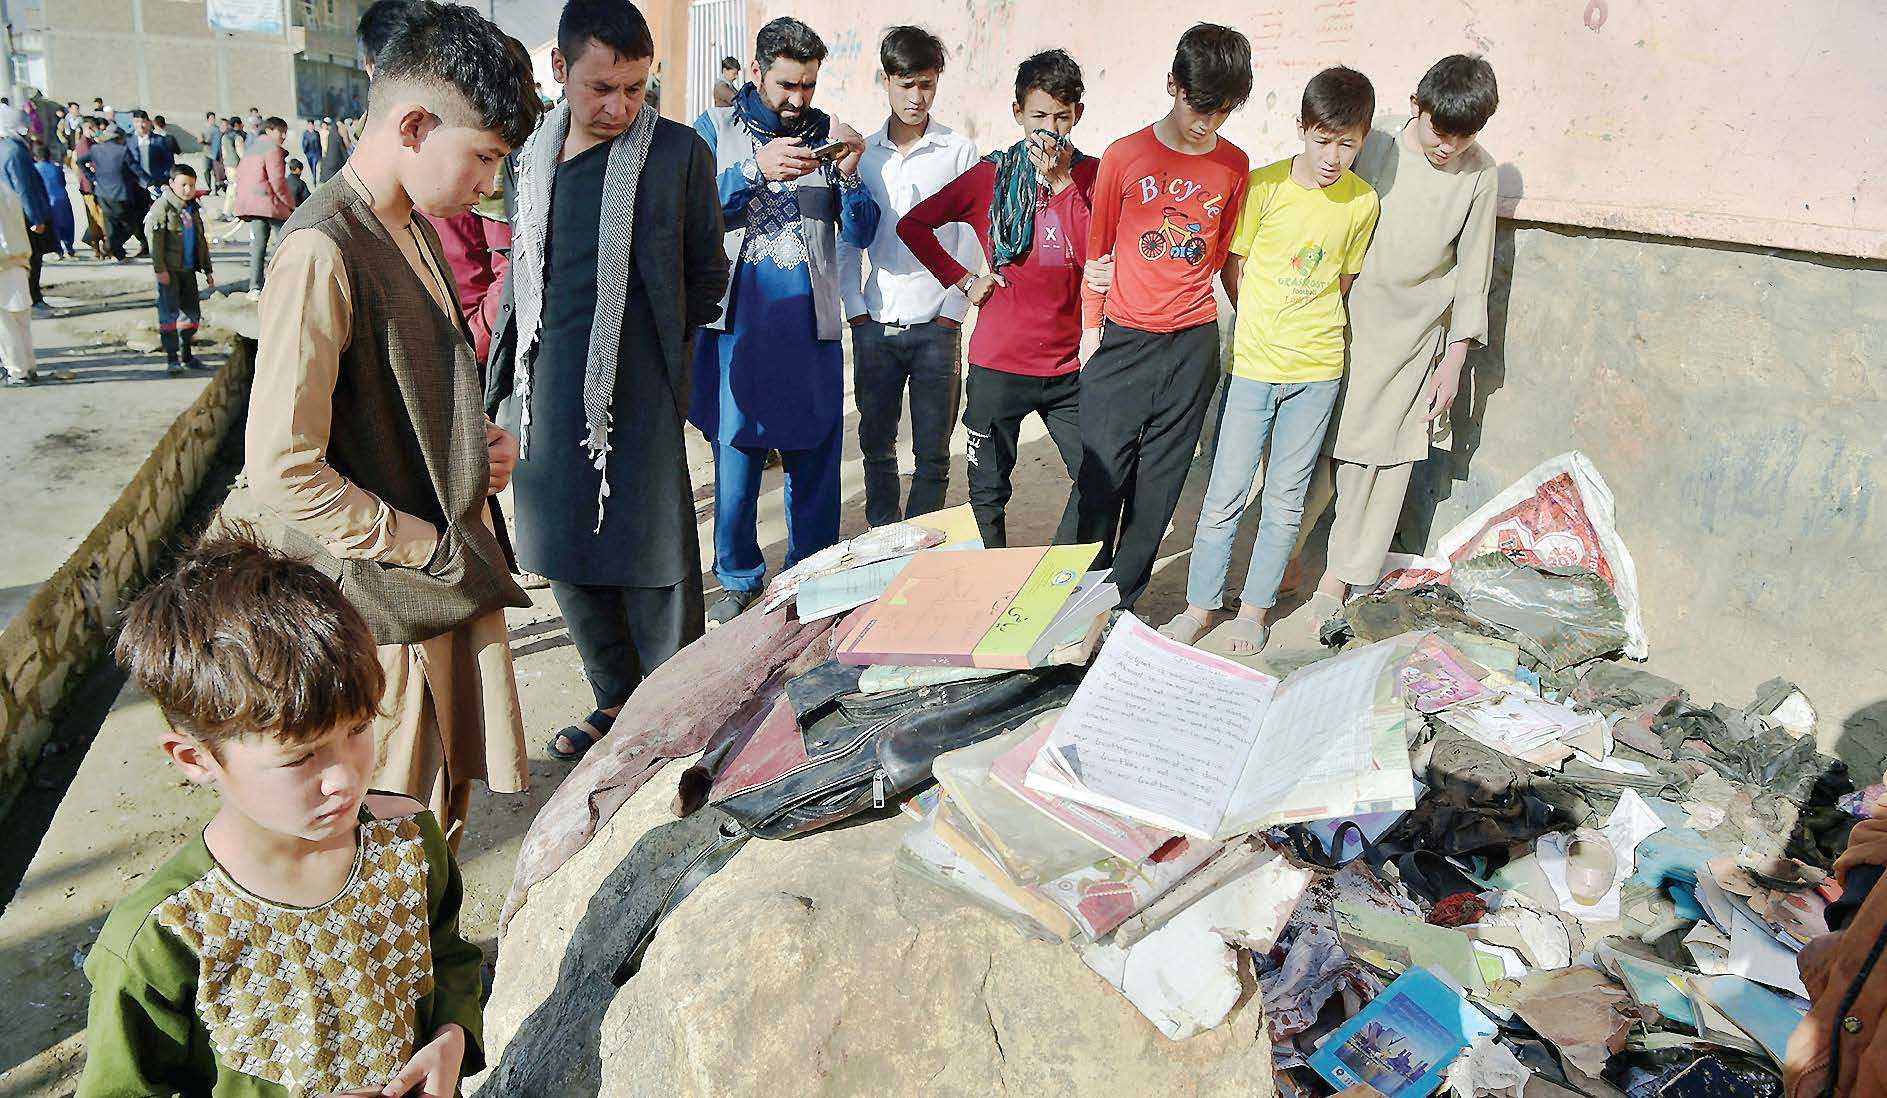 Setelah Serangan Bom di Sekolah, Taliban Umumkan Genjatan Senjata